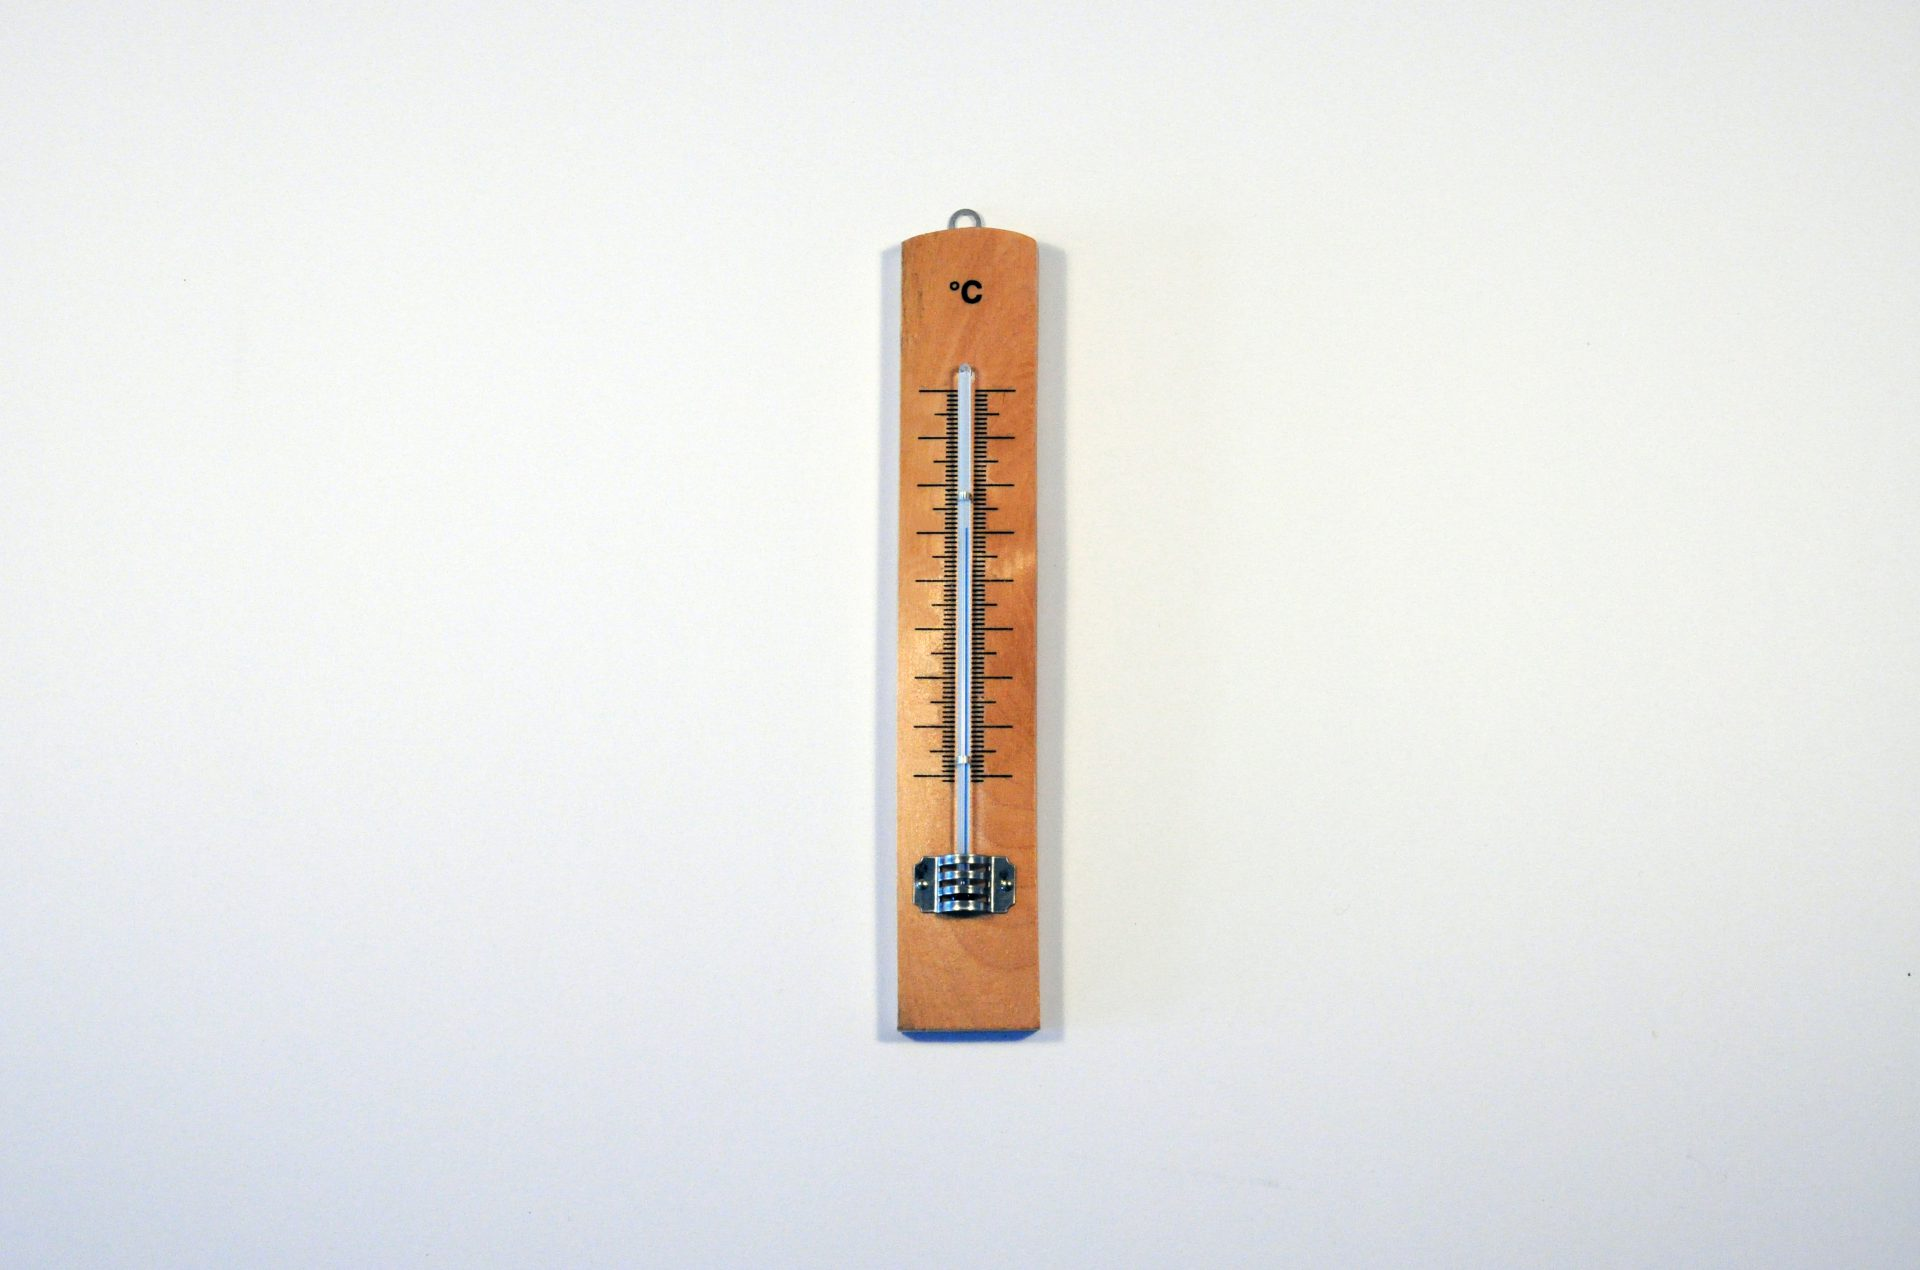 Thermometer | KIEFEL